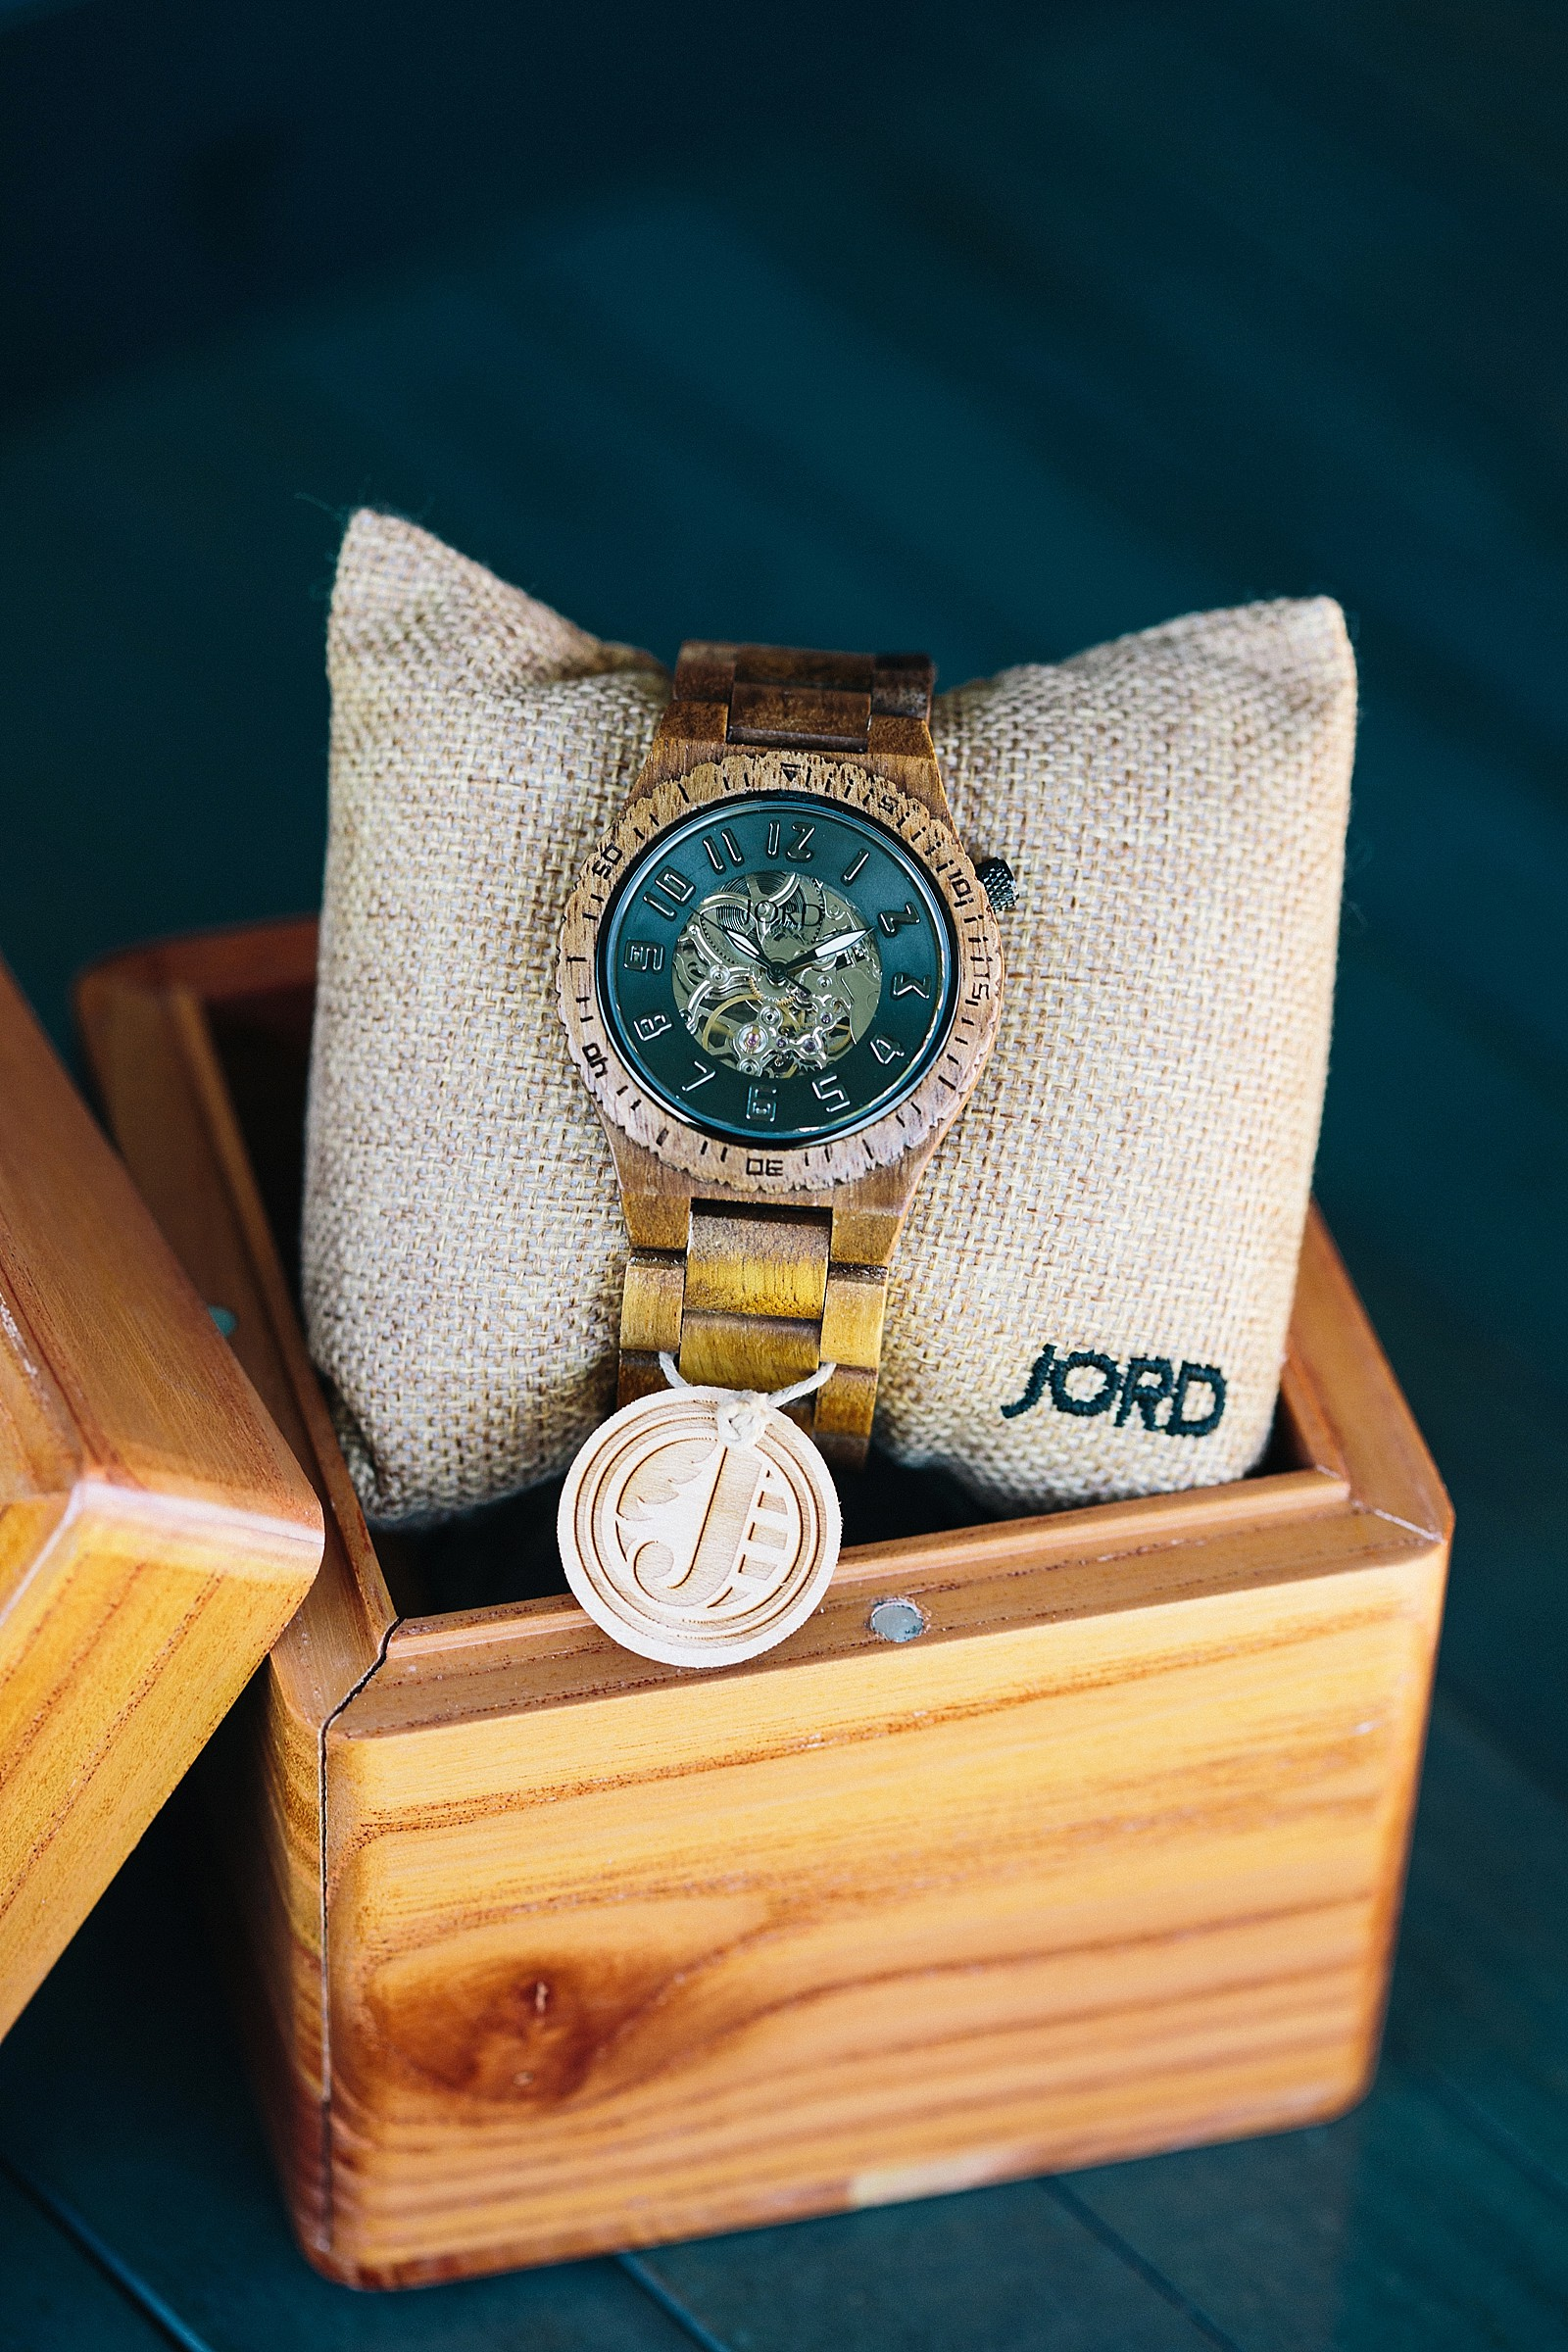 jord-wood-ladies-mens-wood-watch-unique-cool-gift-watch-1281